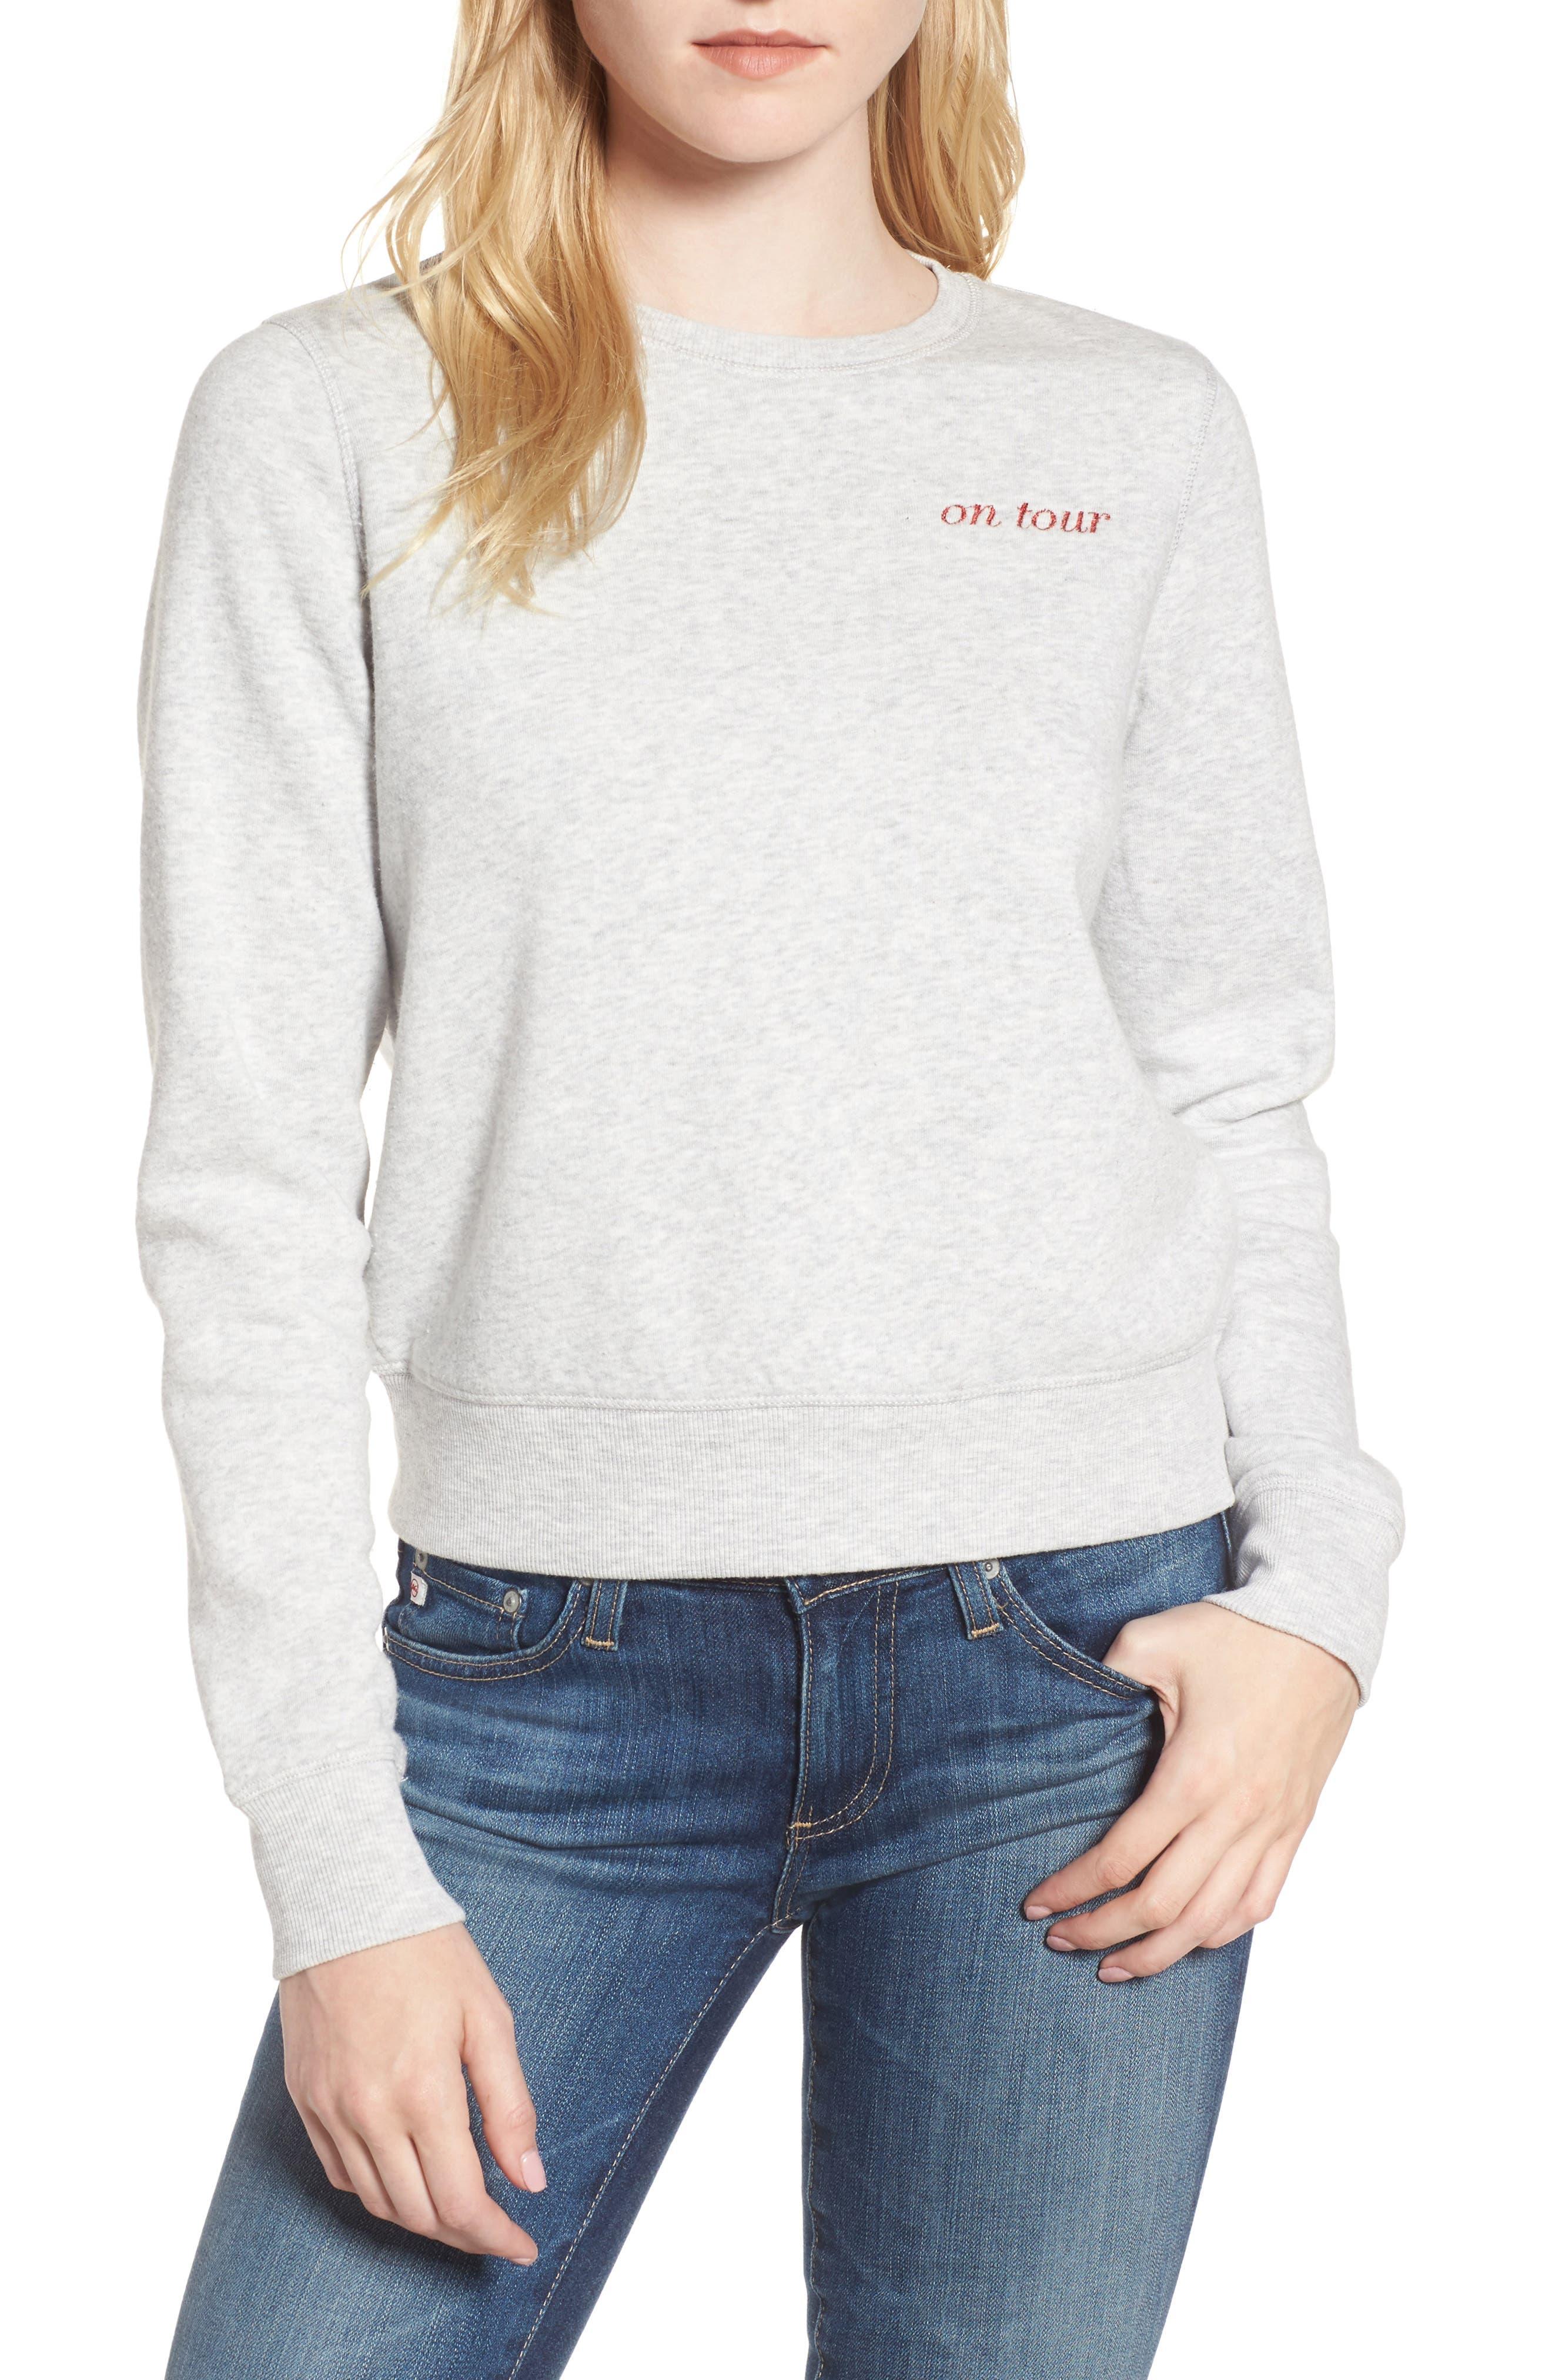 Kassidy Tour Sweatshirt,                         Main,                         color, 096